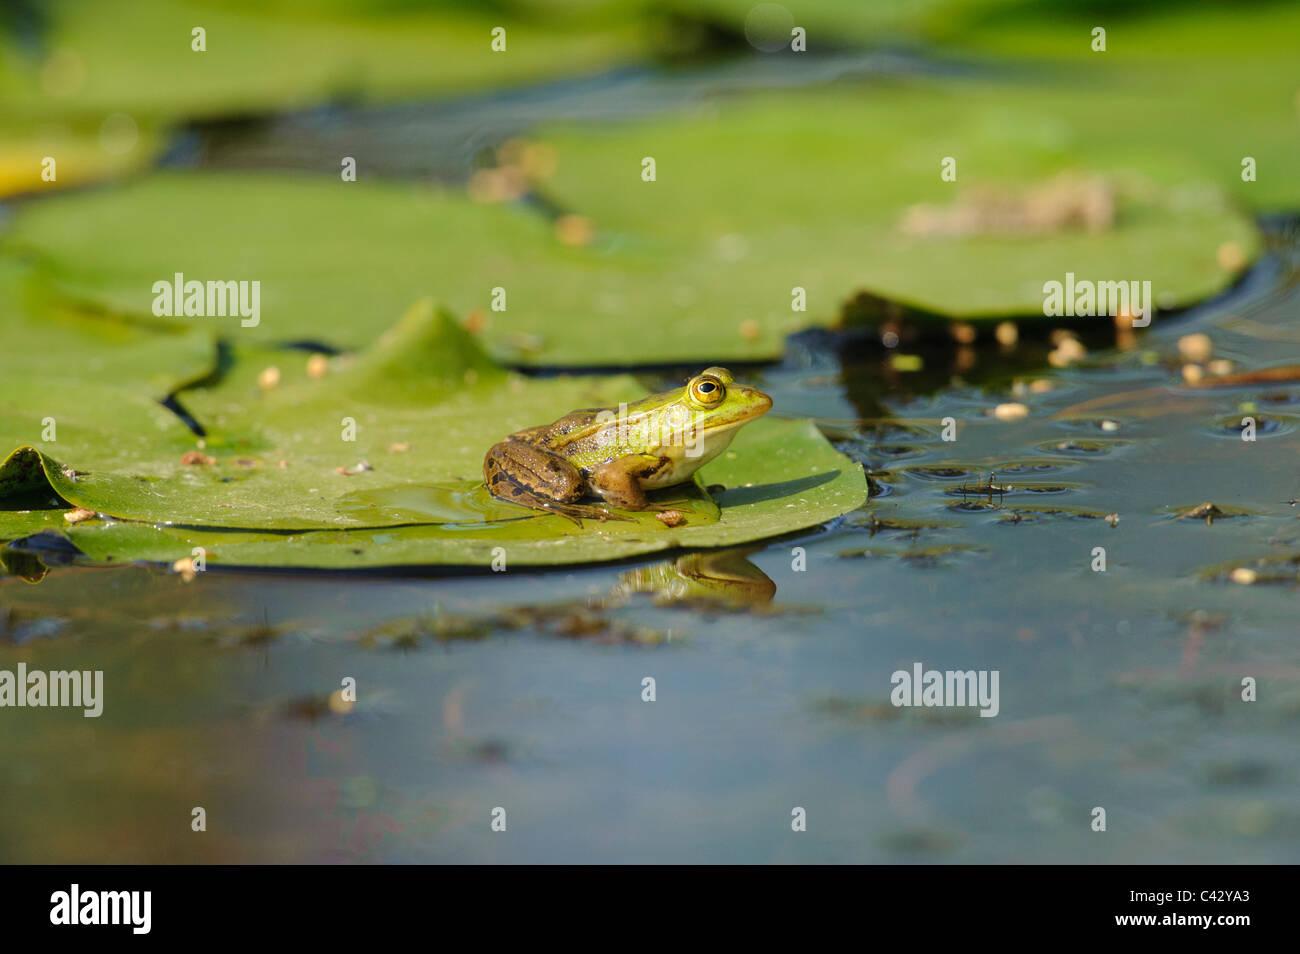 Pool Frog (Rana lesonae), on lily pad - Stock Image